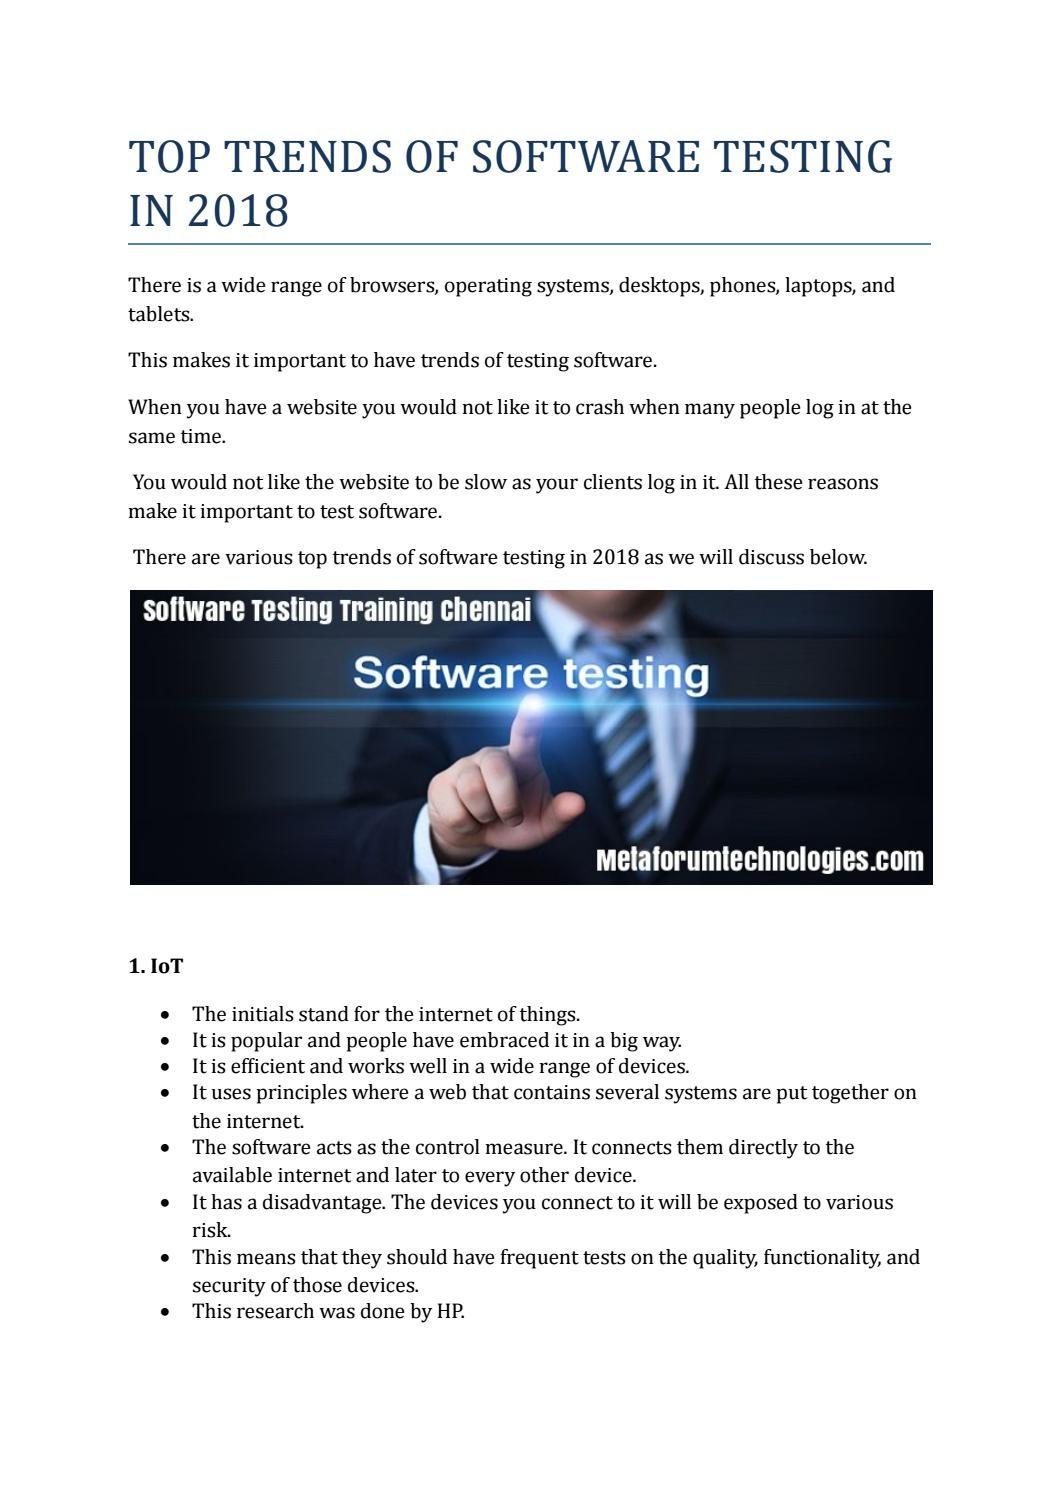 Facts about software testing metaforumtechnologies